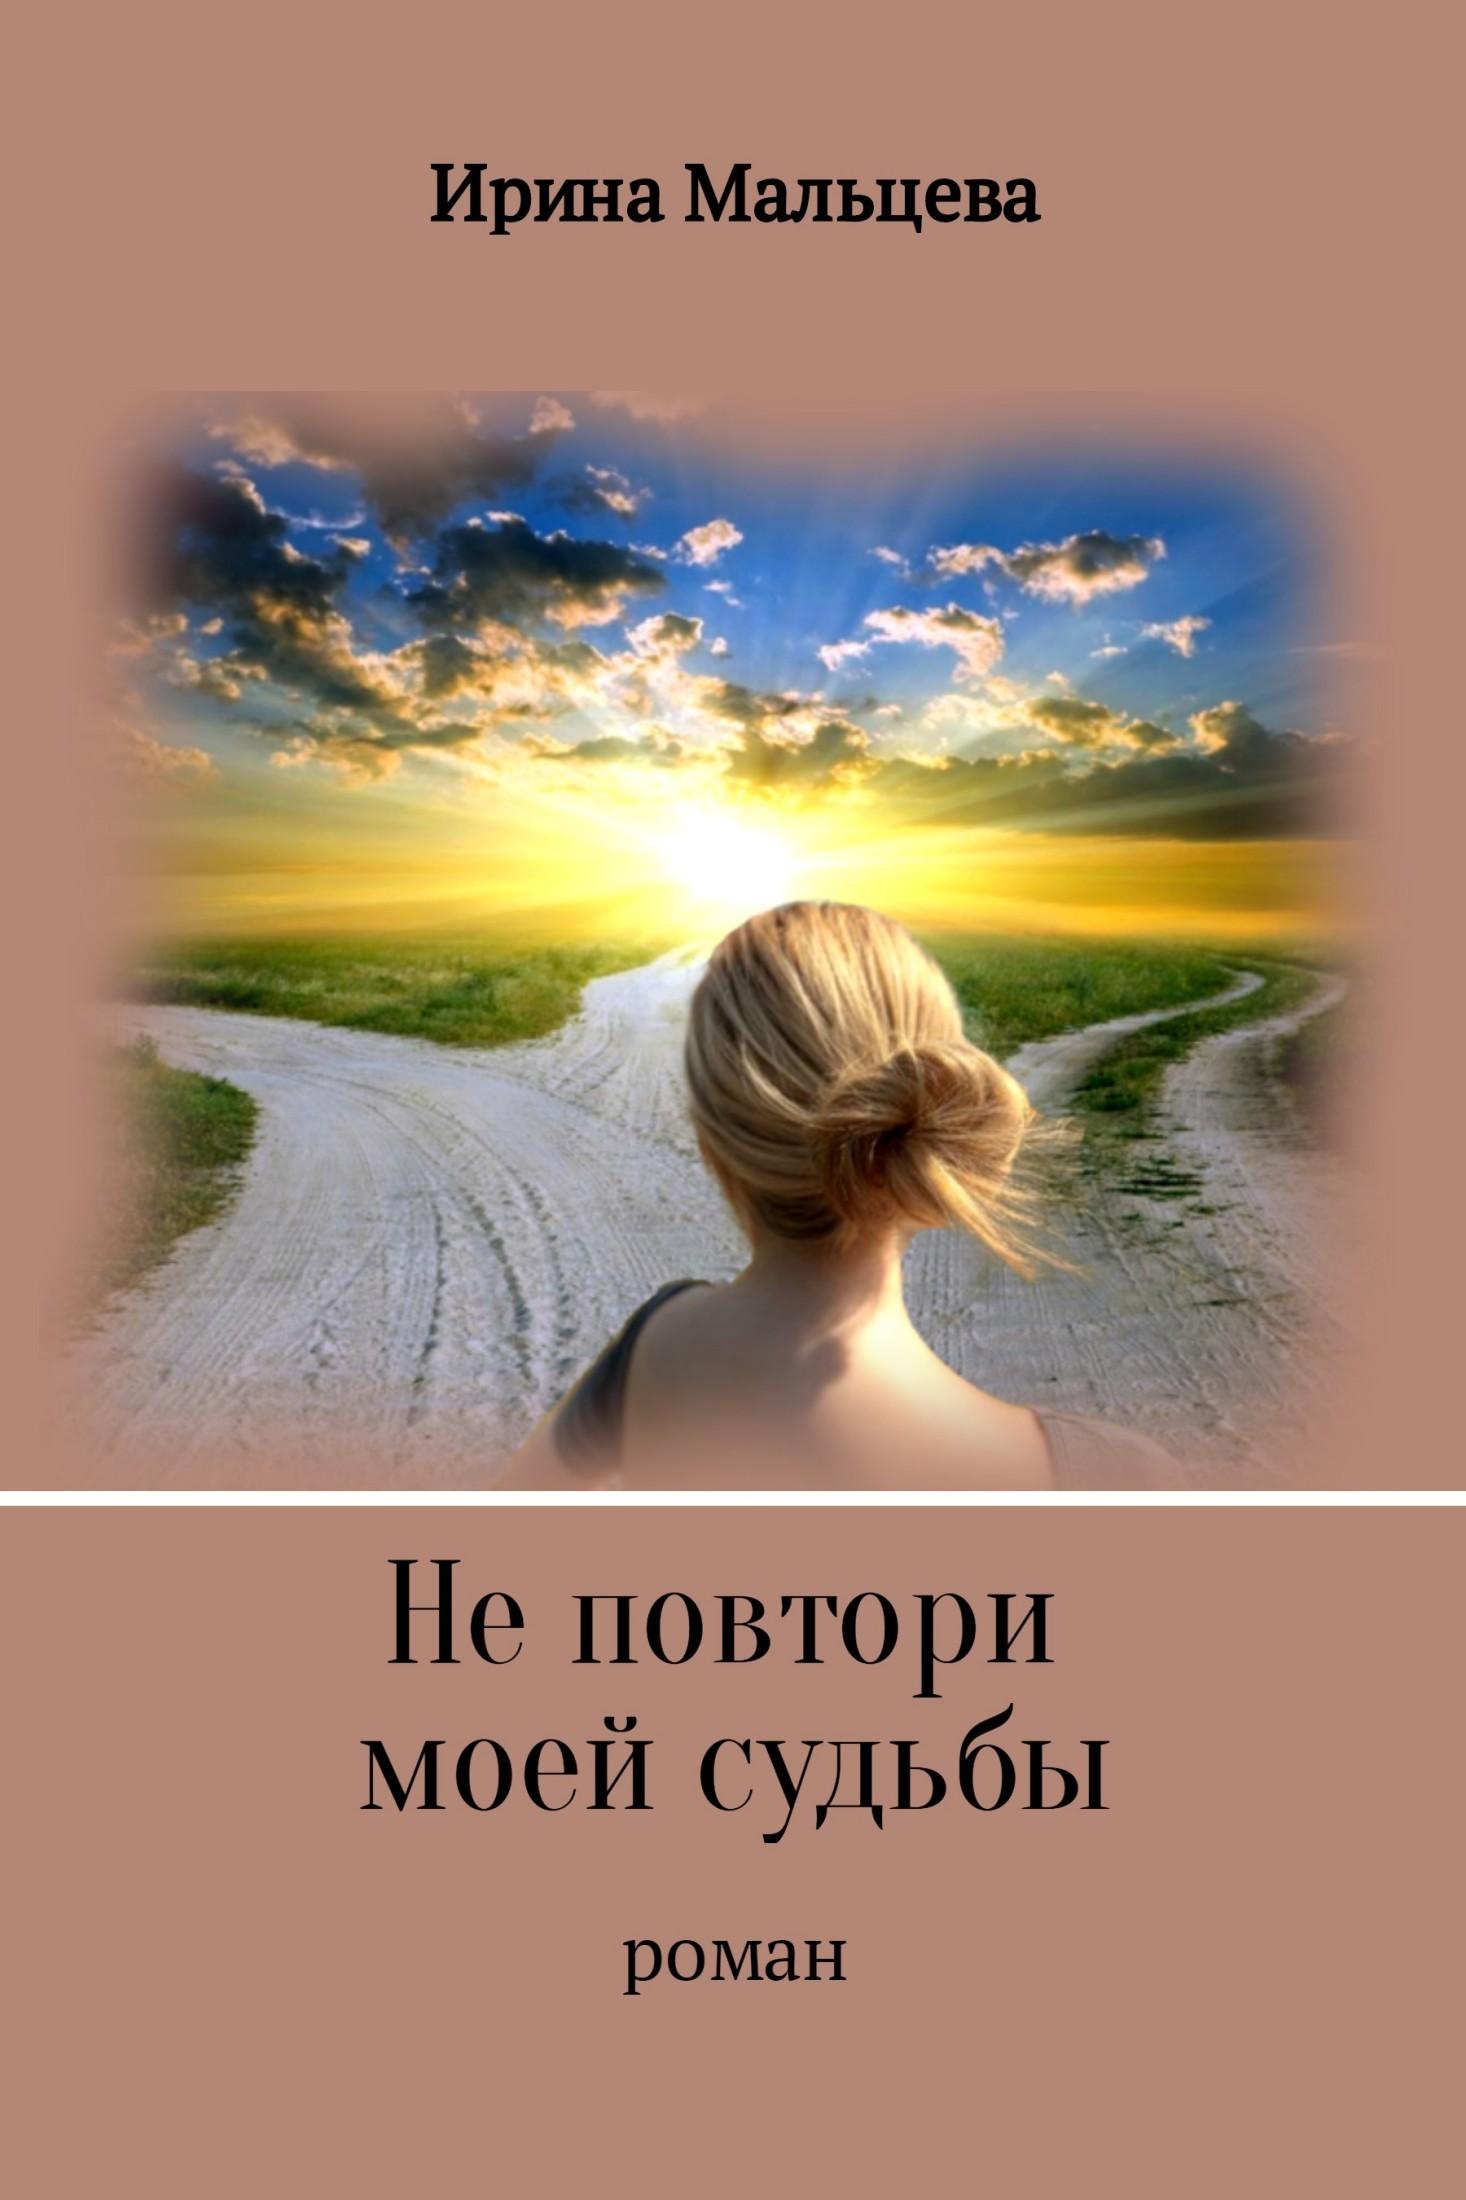 Фото - Ирина Николаевна Мальцева Не повтори моей судьбы ирина николаевна юсупова научи себя любви…